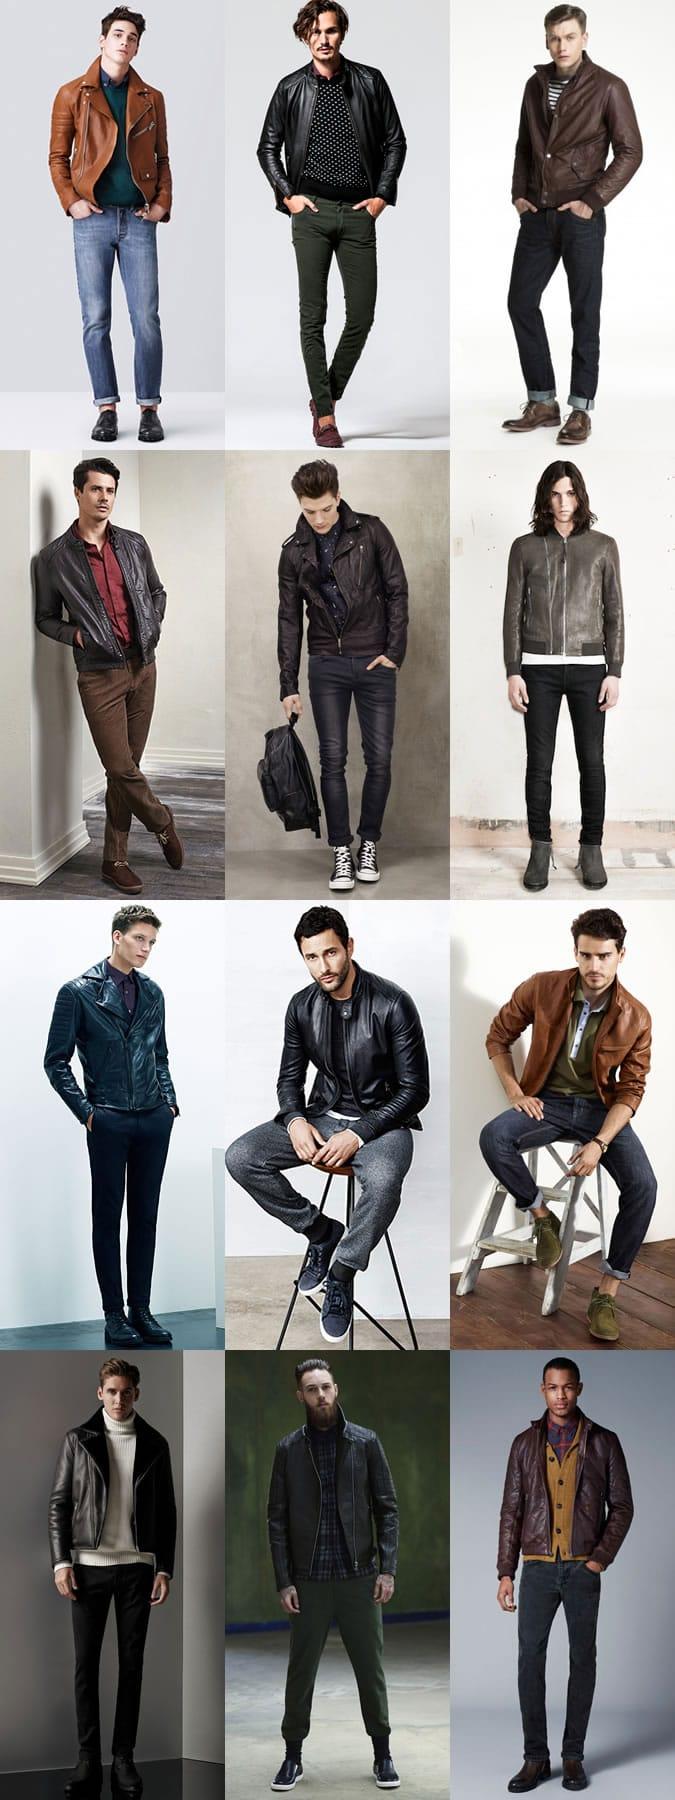 Look Book кожаных мужских курток